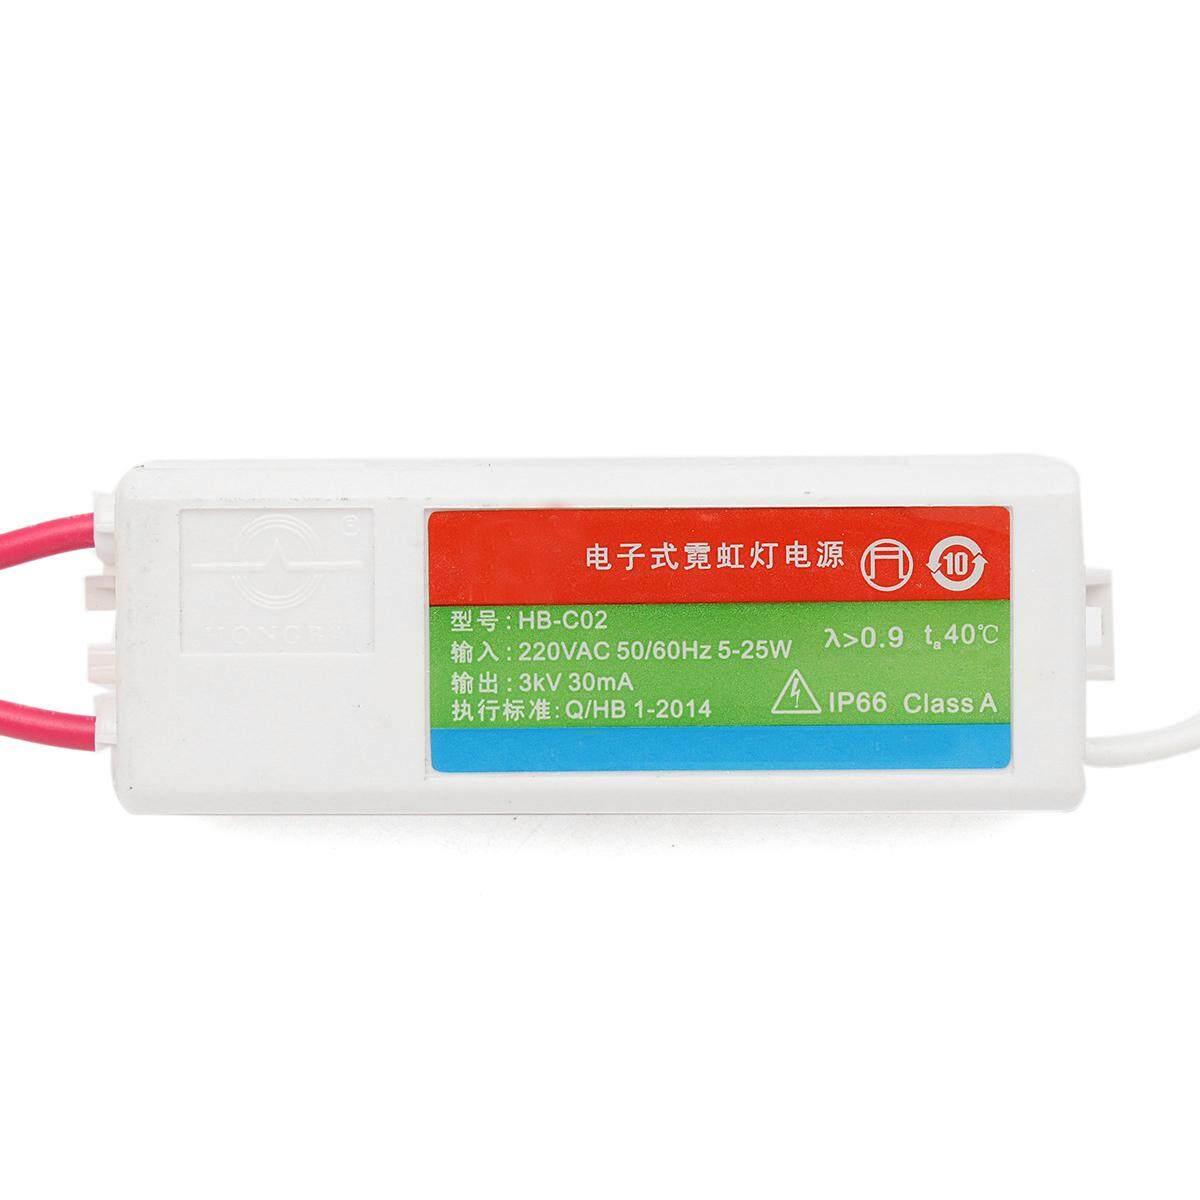 HB-C02 Plastic Neon Light Electronic Transformer 3KV 30mA Load Neon Sign Power Supply - intl - 4